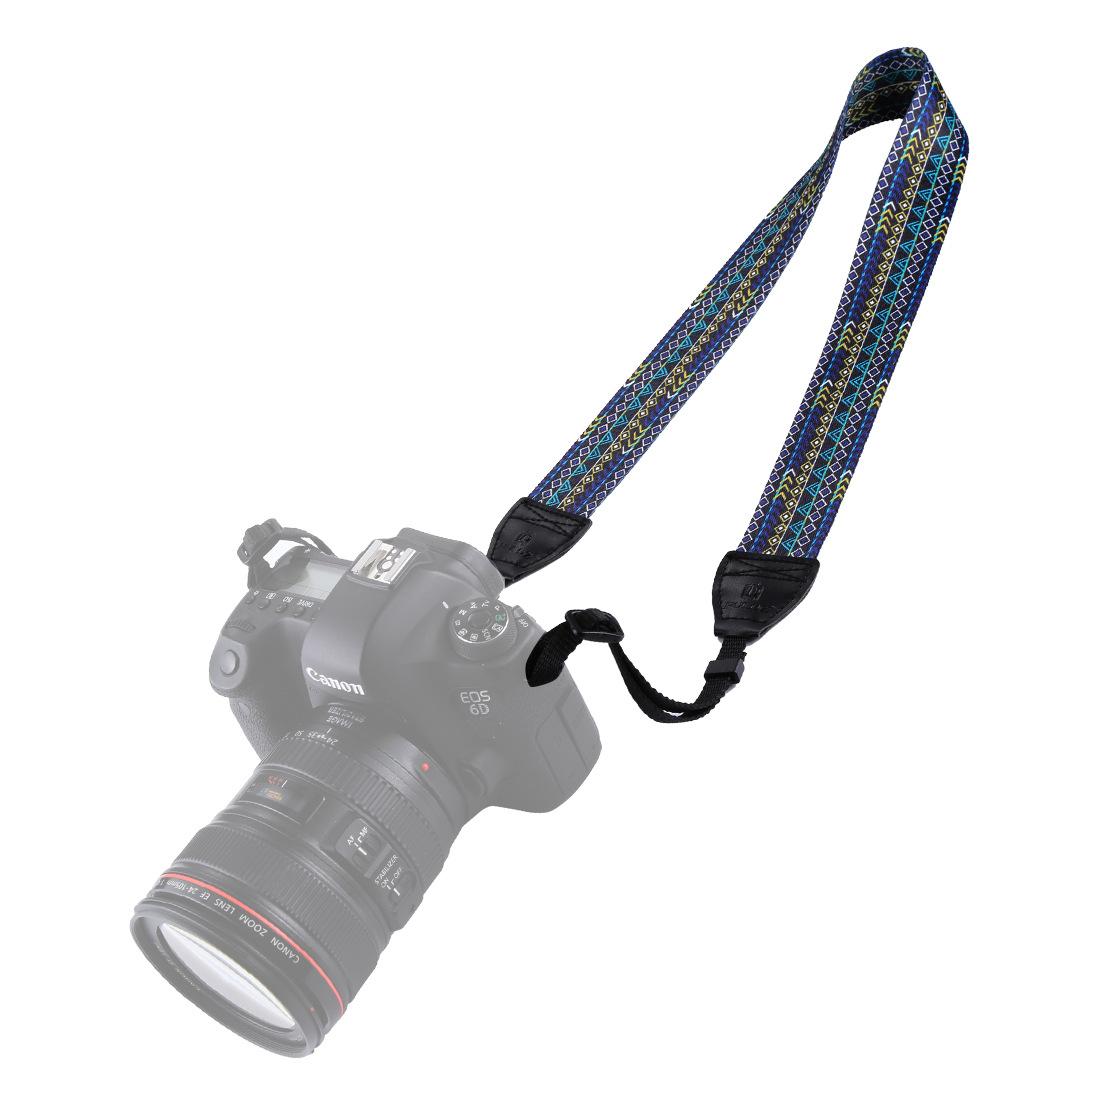 PULUZ Retro Ethnic Style Shoulder Neck Strap Camera Strap Belt for Sony Canon SLR DSLR Cameras  PU6008A